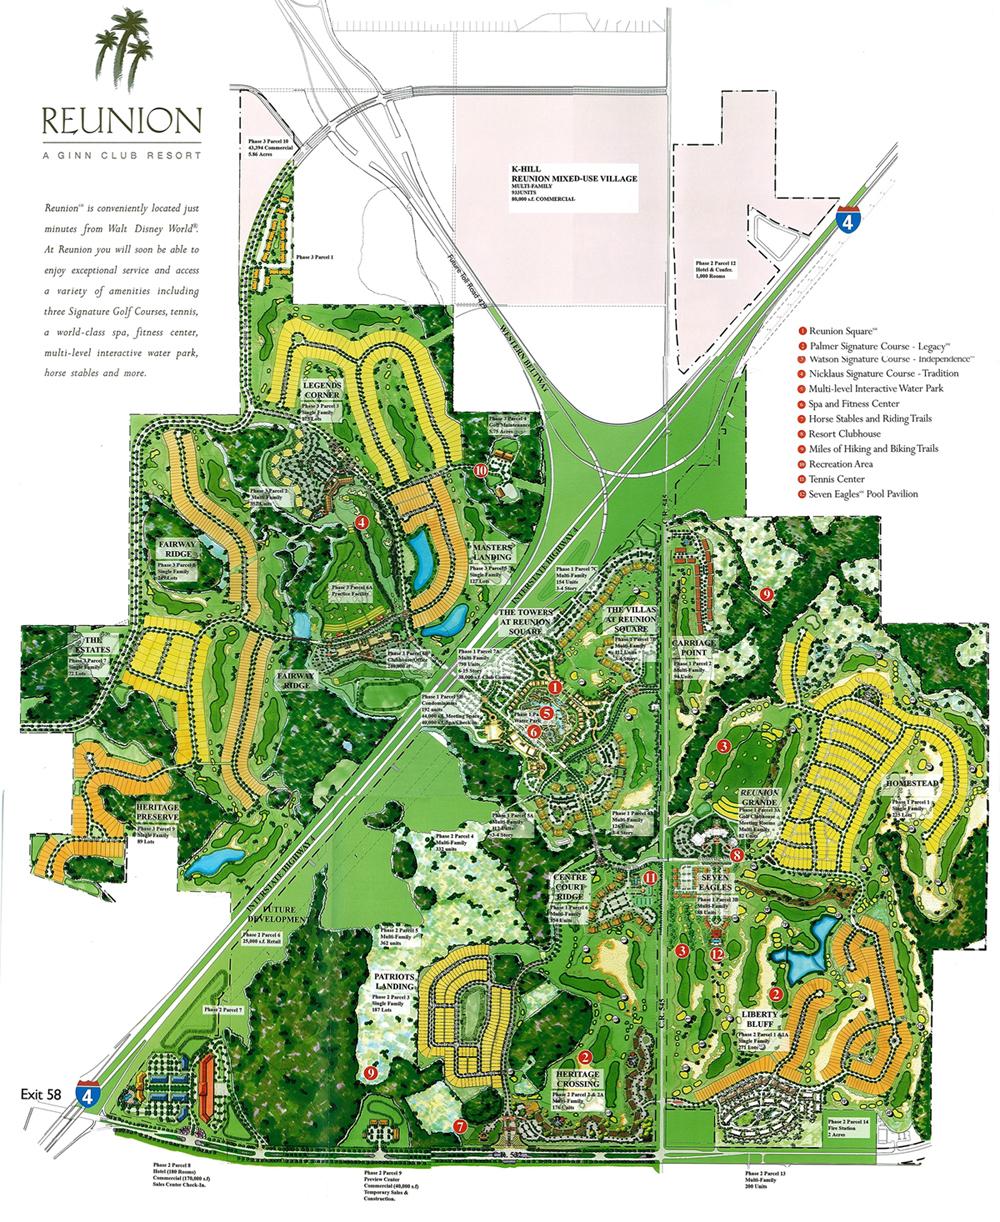 Reunion Resort – Juan Delgado Real Estate 2018 - Map Of Reunion Resort Florida